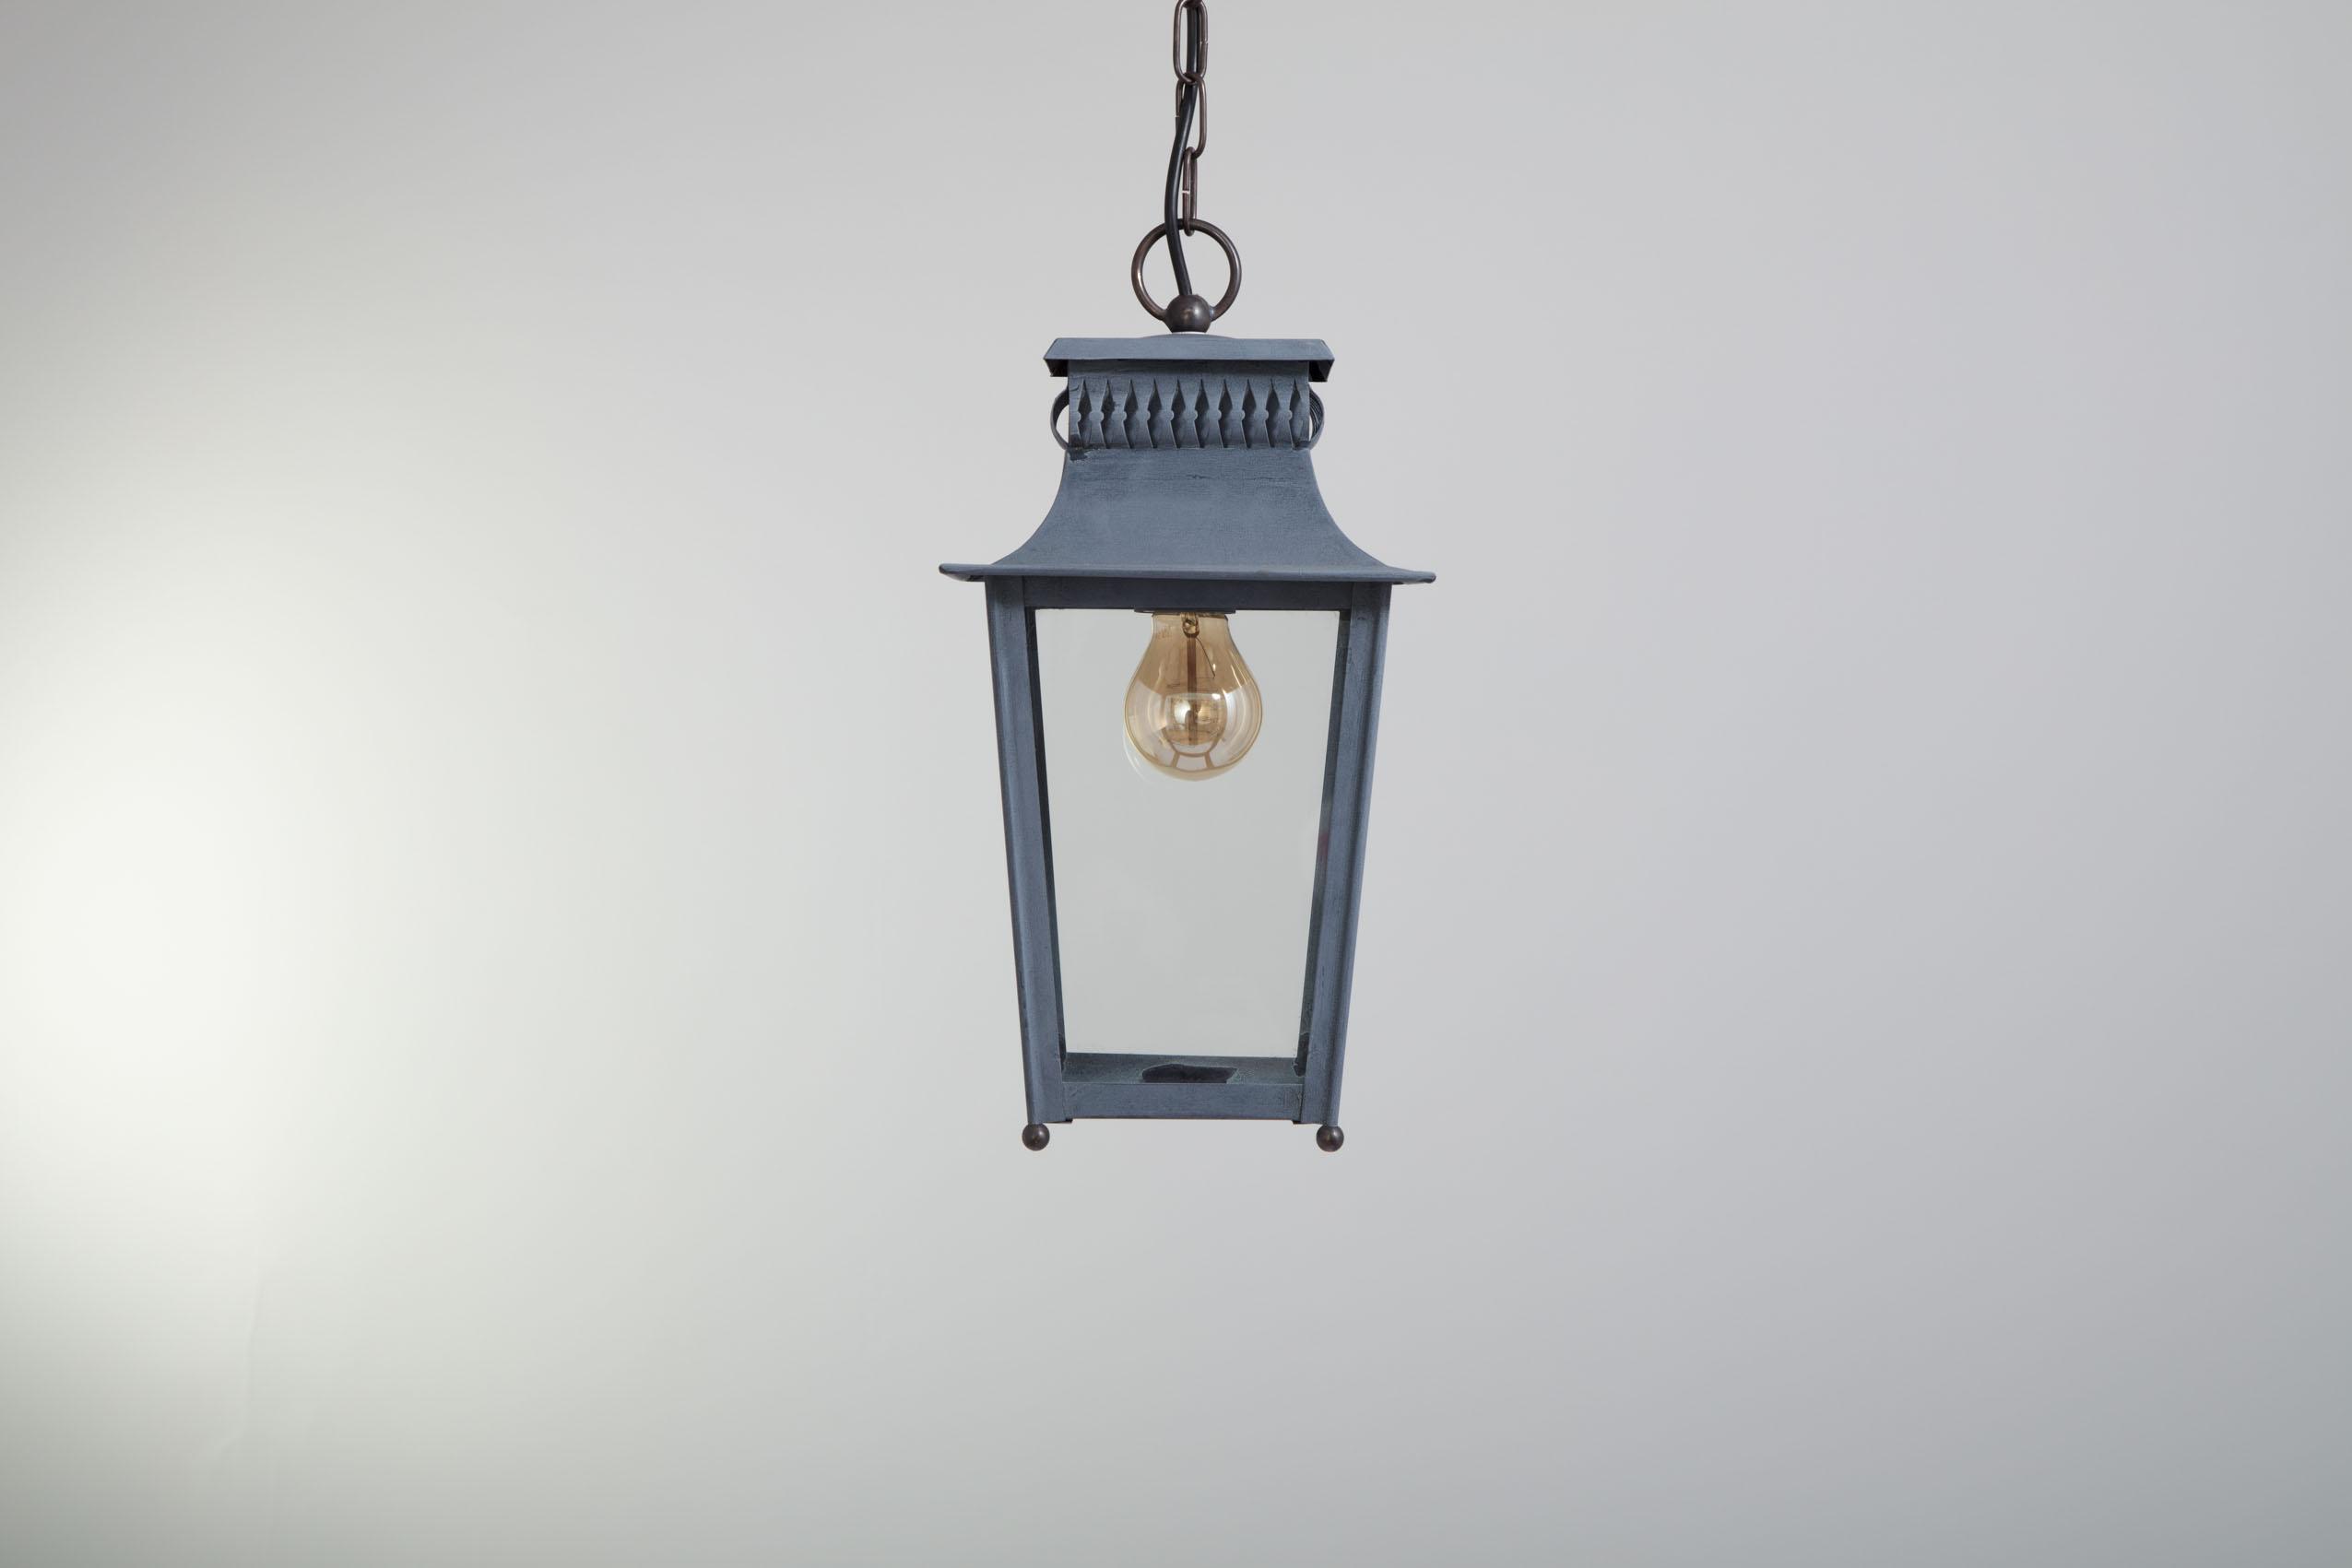 Lanterne design most cool small rustic pendant lights - Lanterne en bois ...